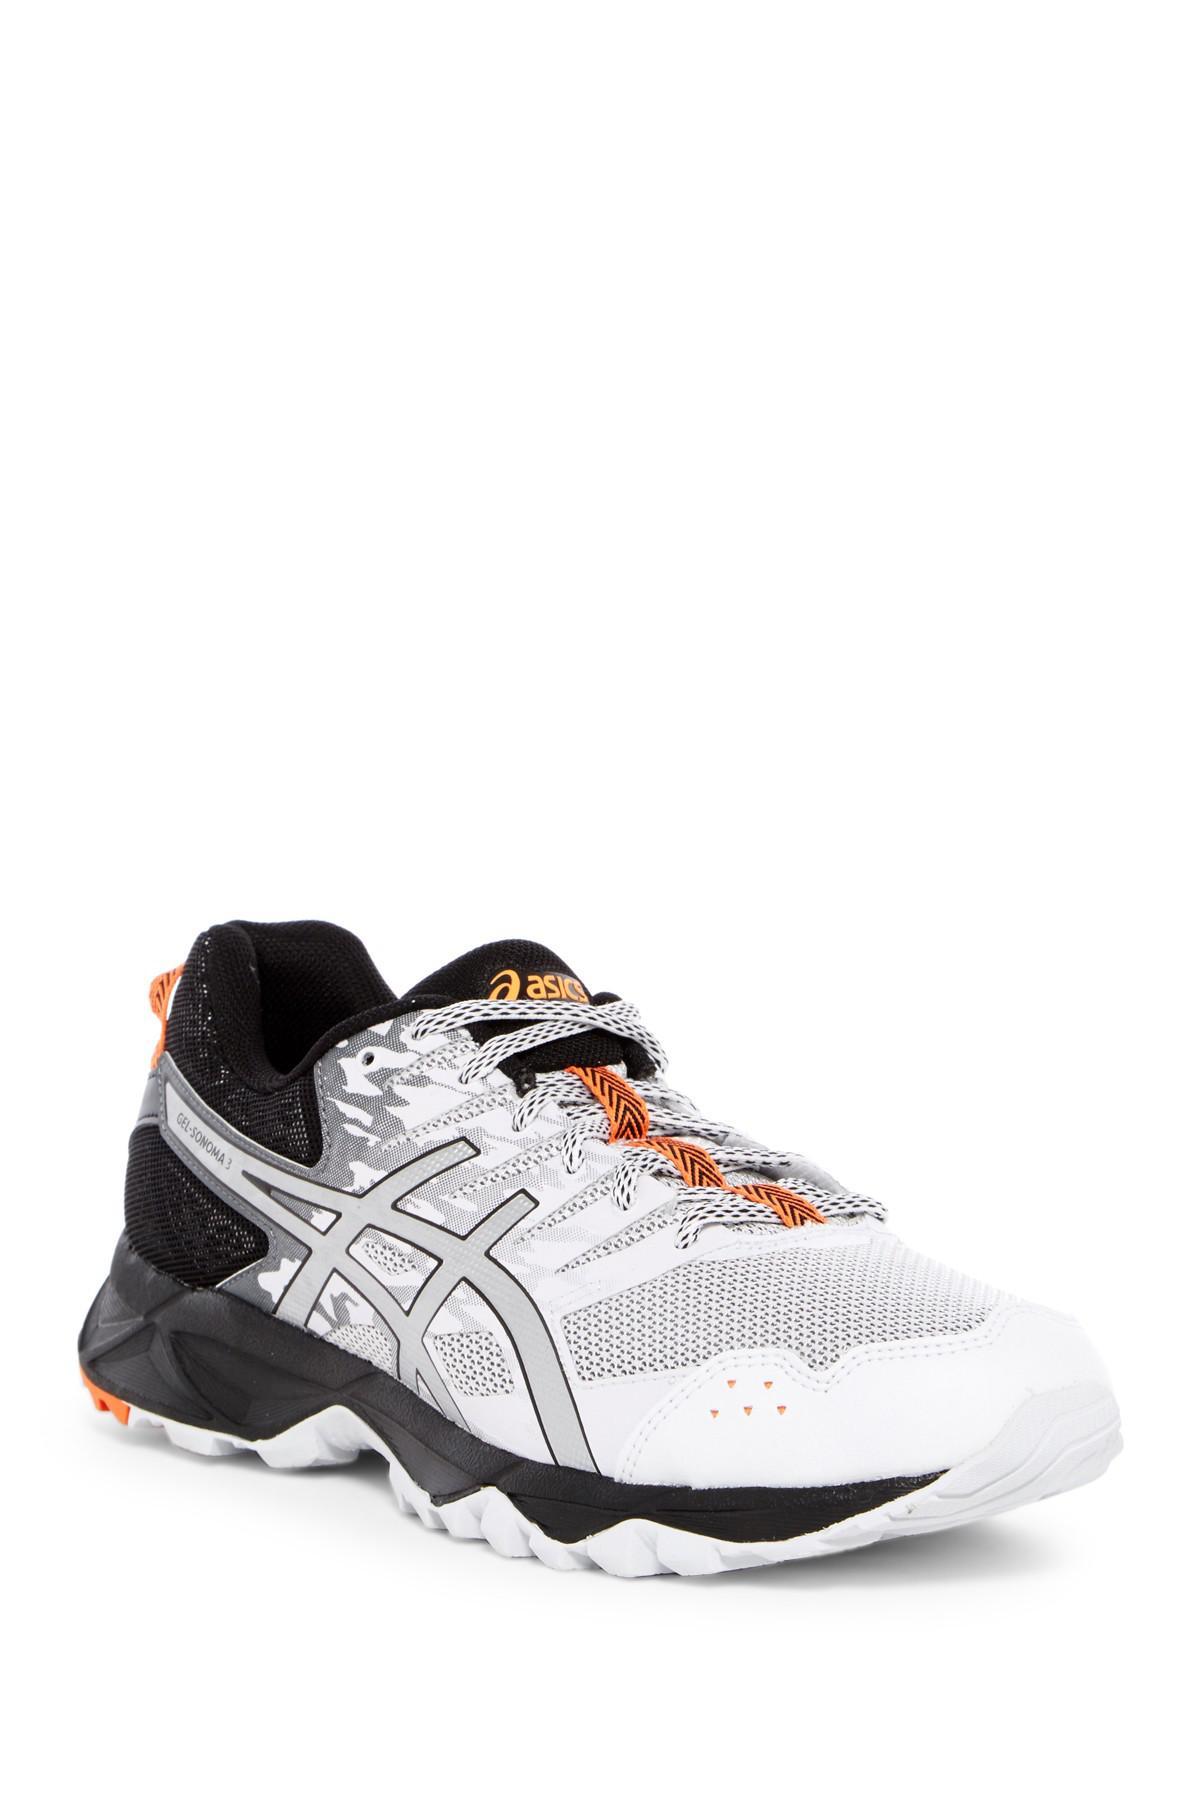 Sneaker Lyst Asics Gel Sonoma Sneaker 3 pour Homme Asics Homme 2dc9856 - beautylady.info